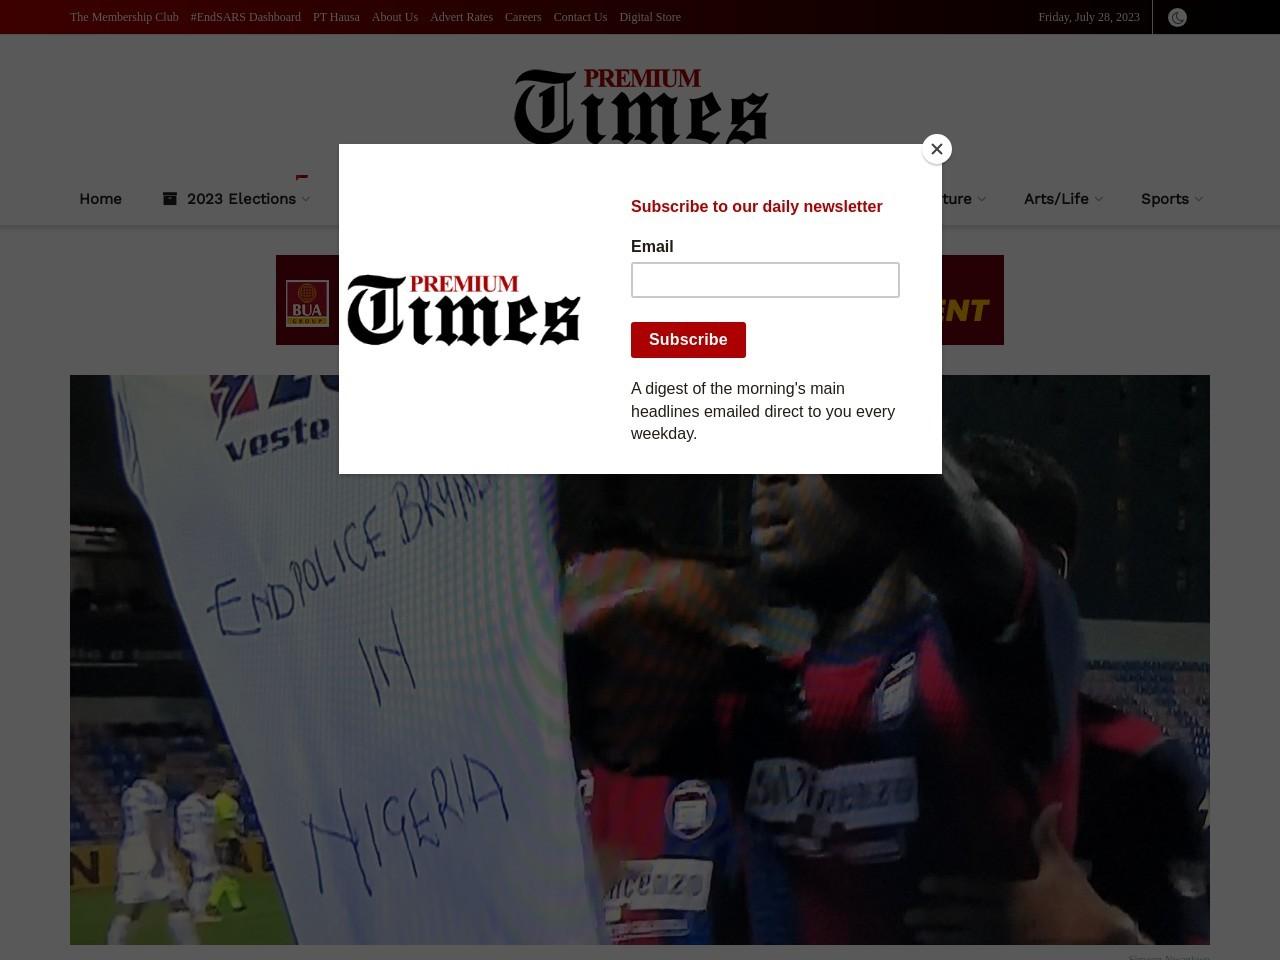 #EndSARS: Nigerian striker shows solidarity after scoring against Juventus